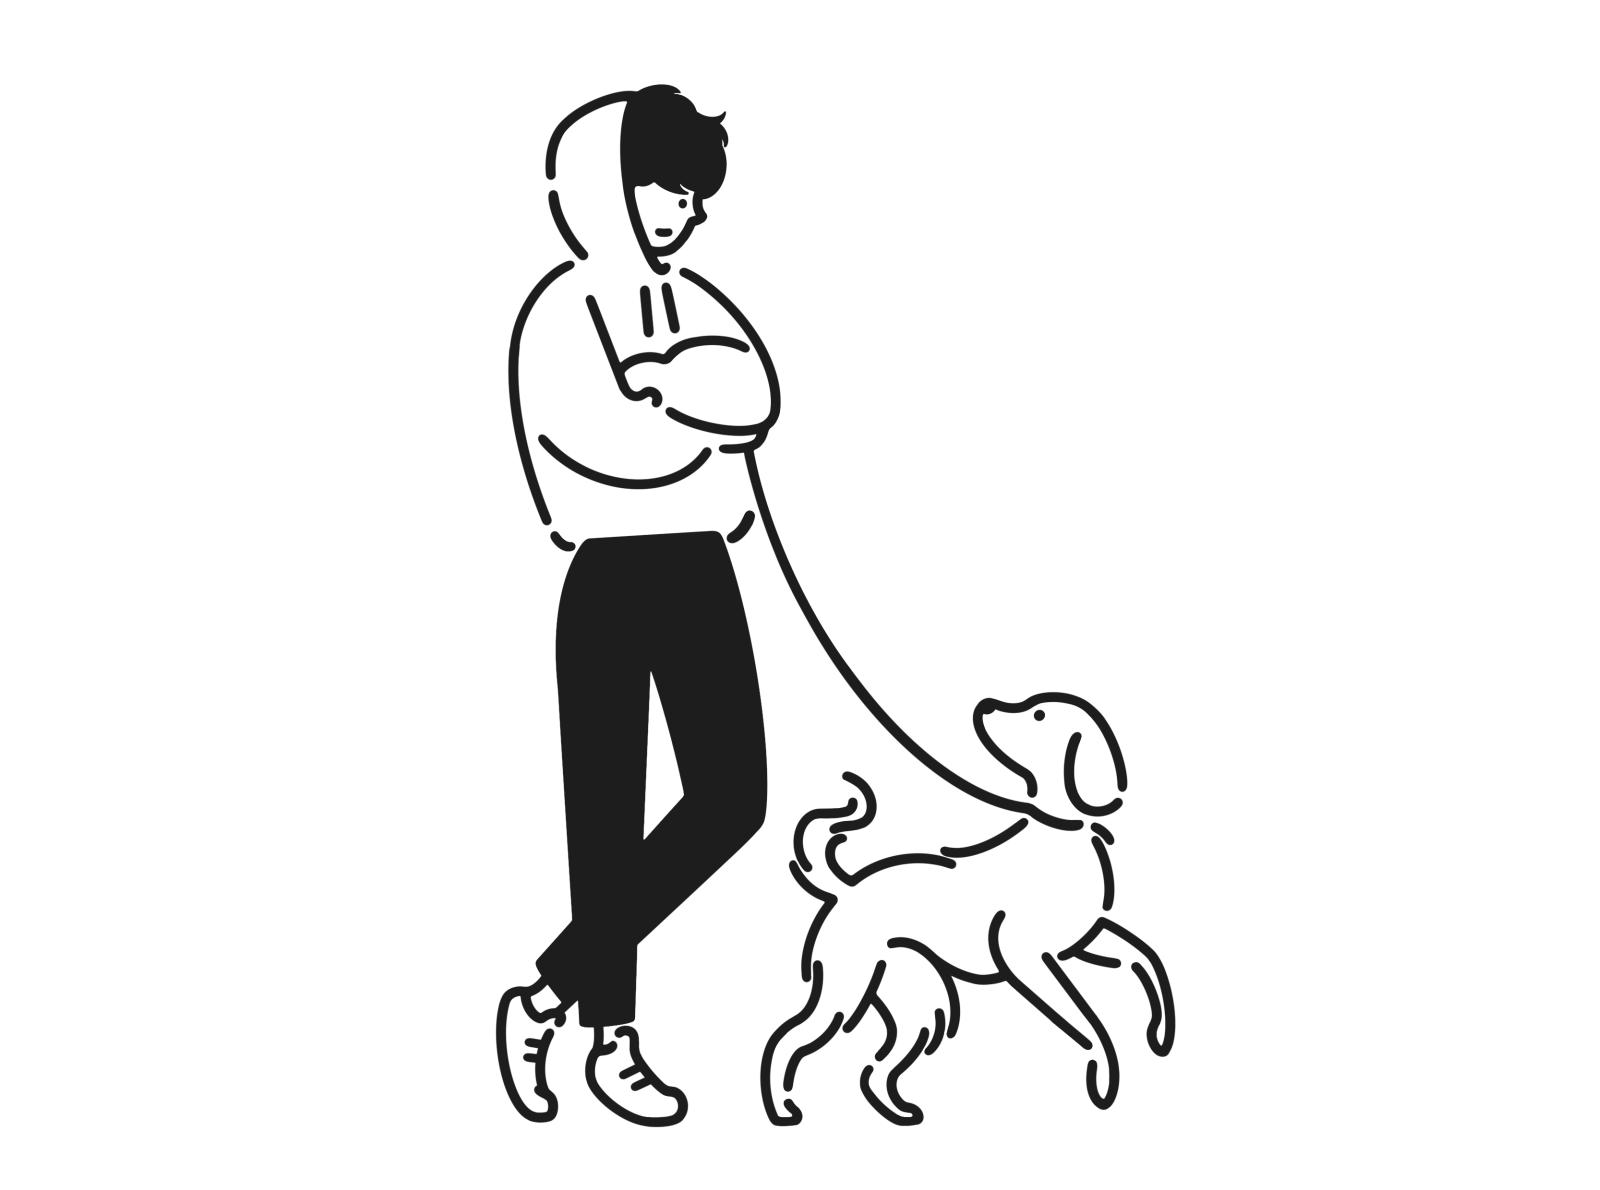 Boy And Dog Dog Line Art Line Art Drawings Mini Drawings